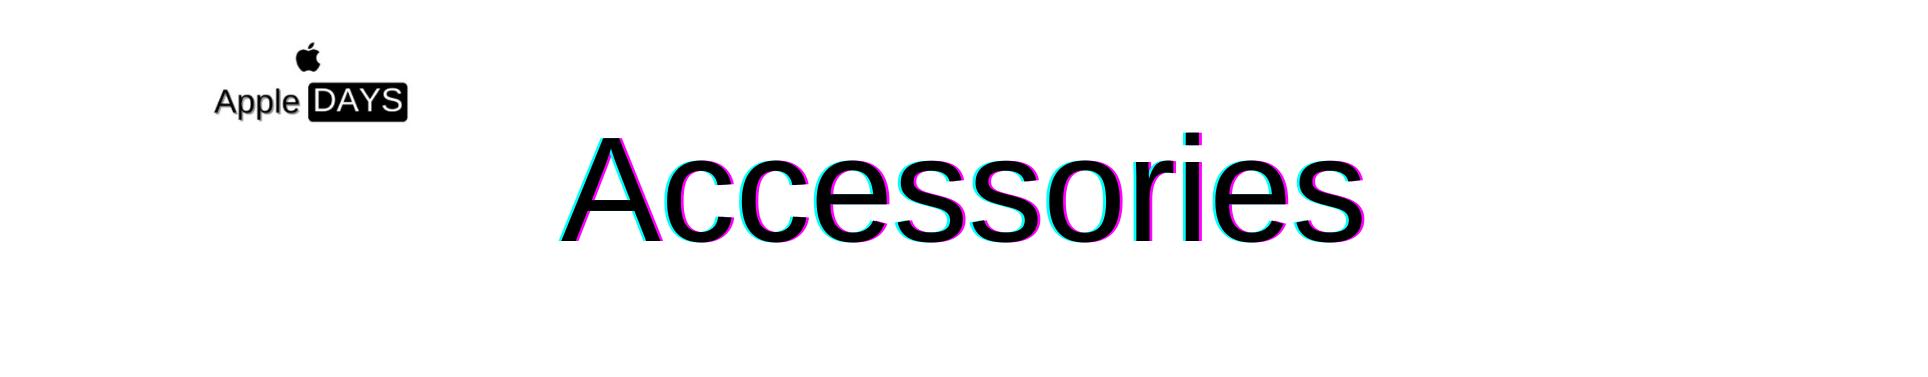 appledays_accessories_web